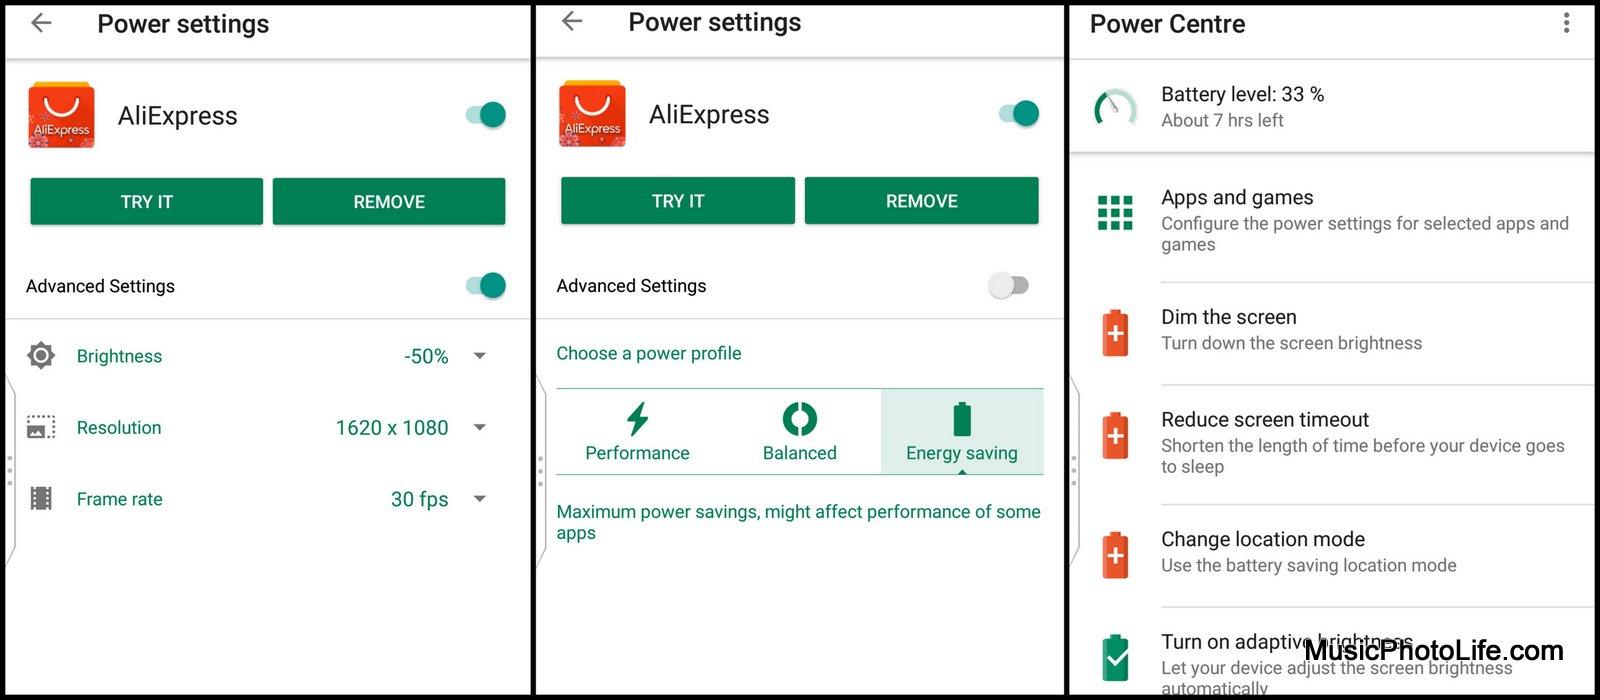 BlackBerry KEYone Black Edition - Power Centre screenshot